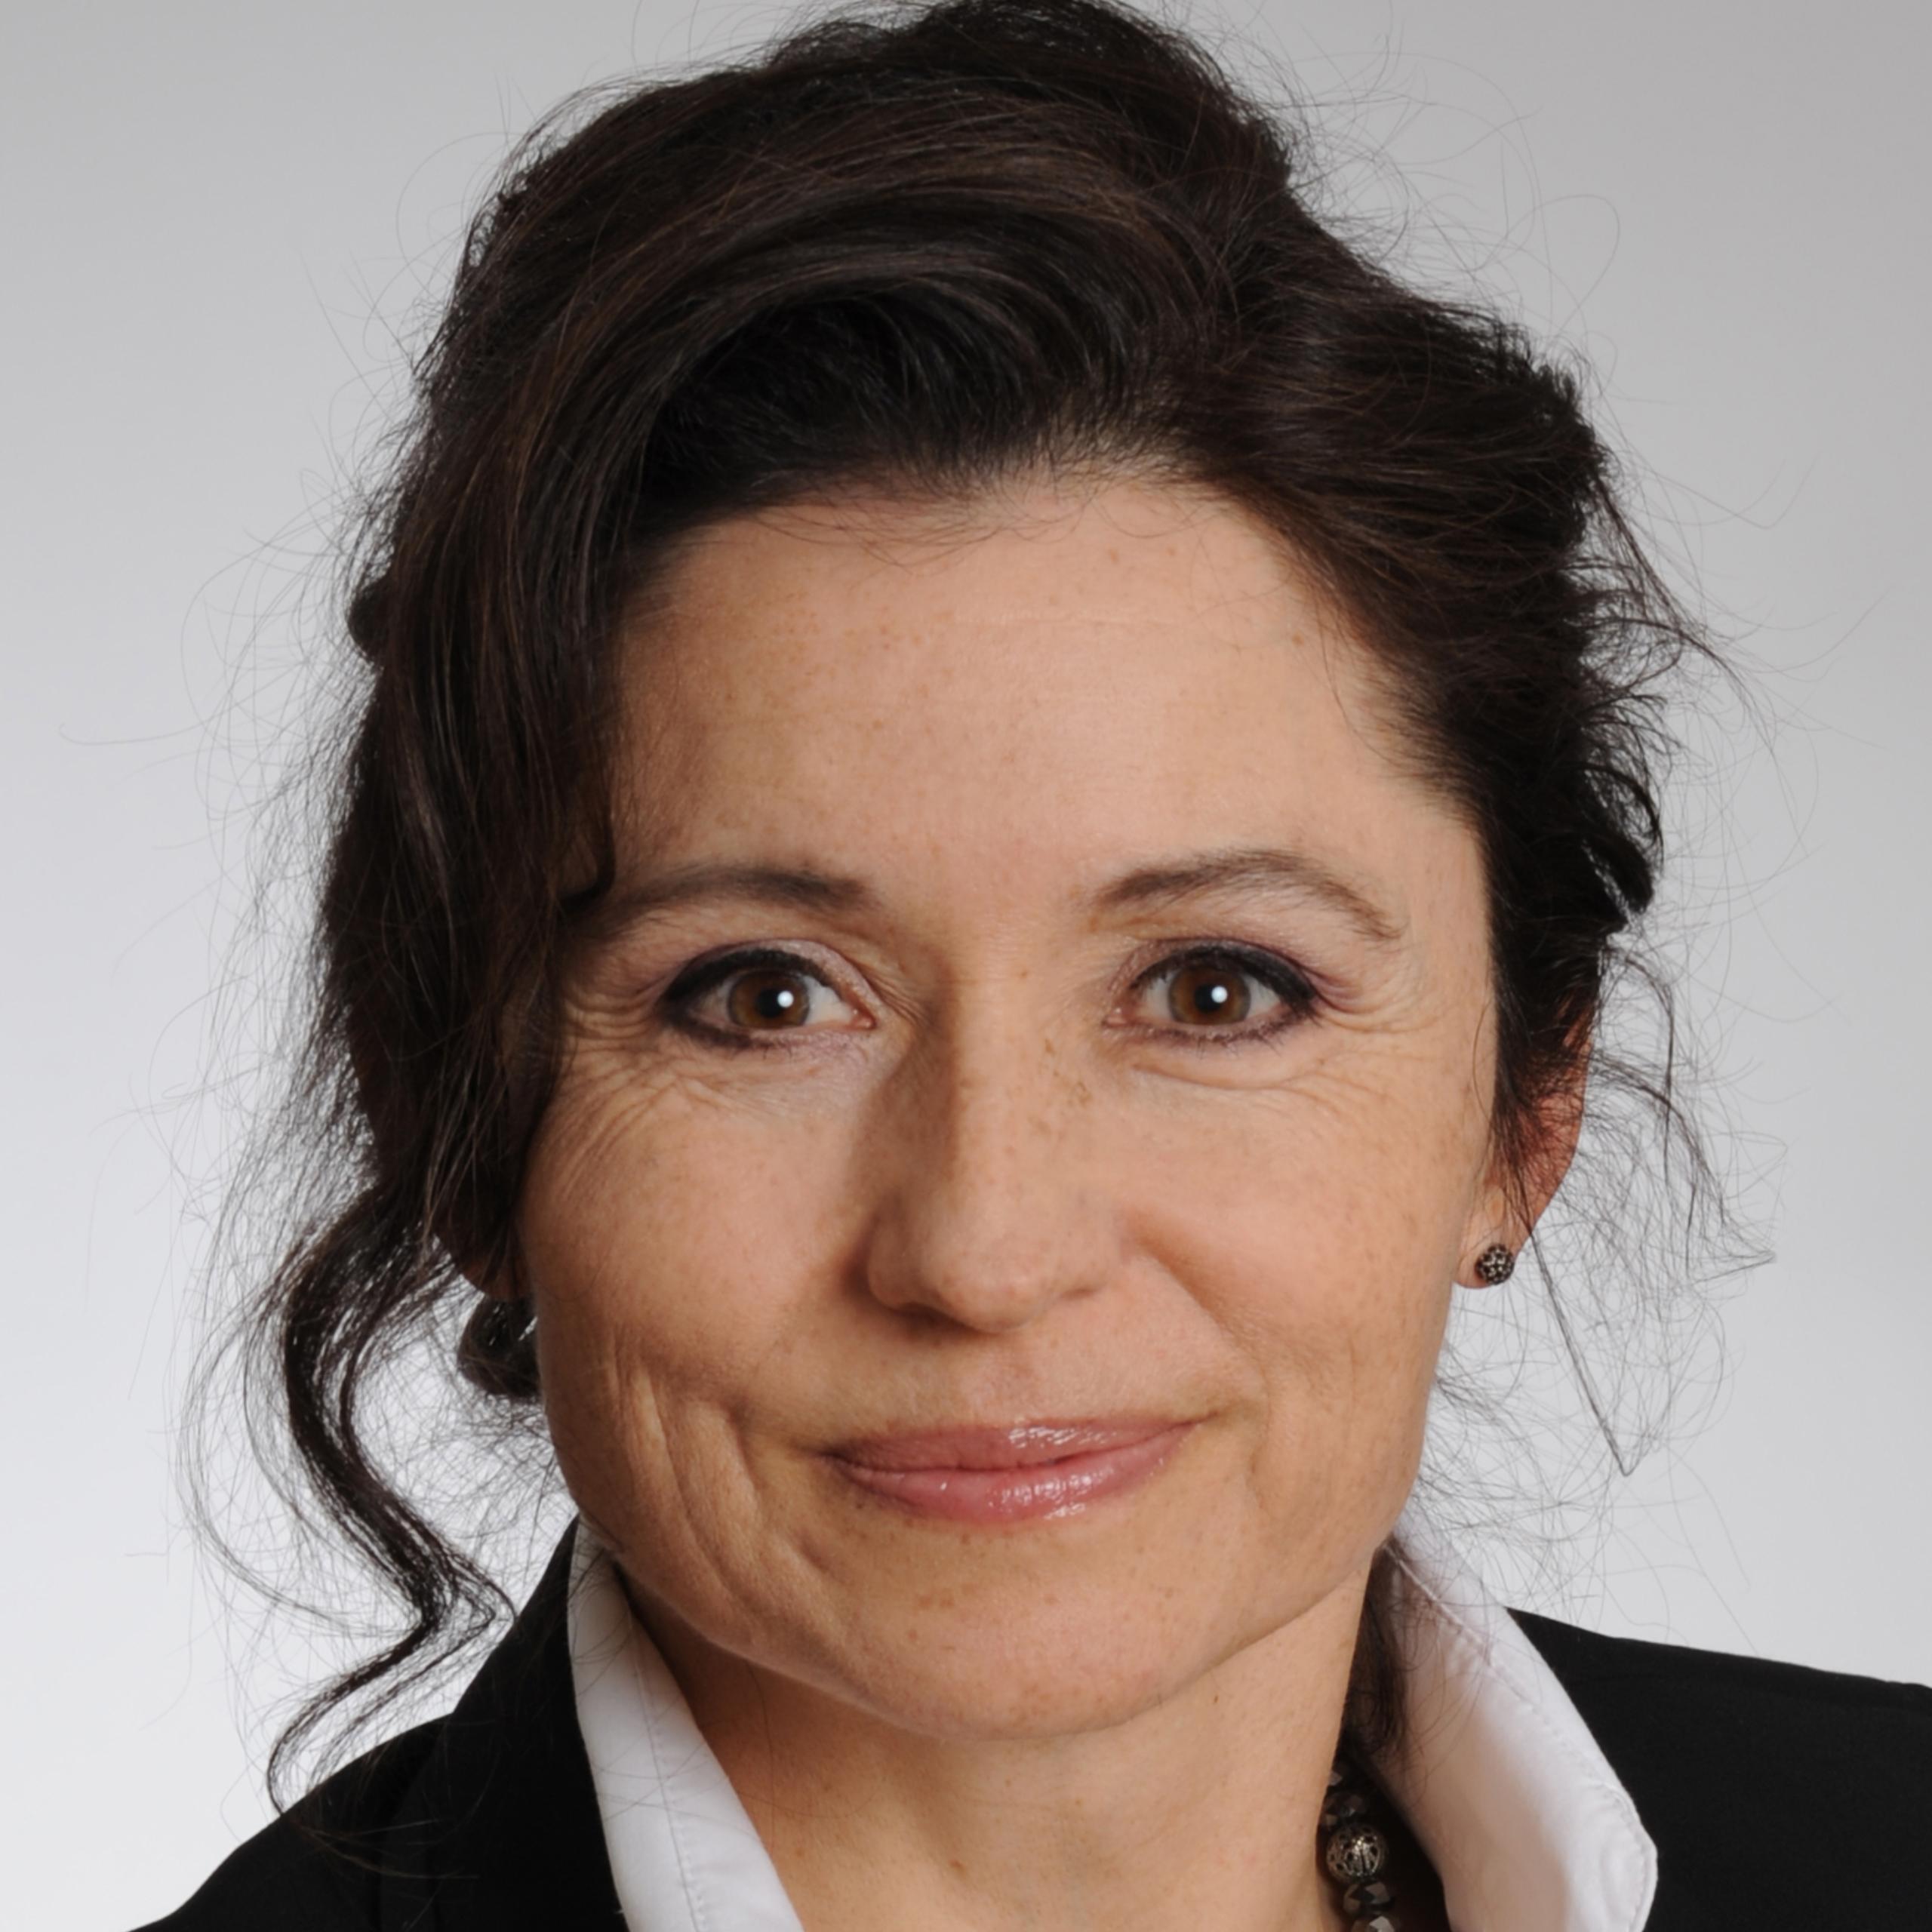 Birgit Eiber